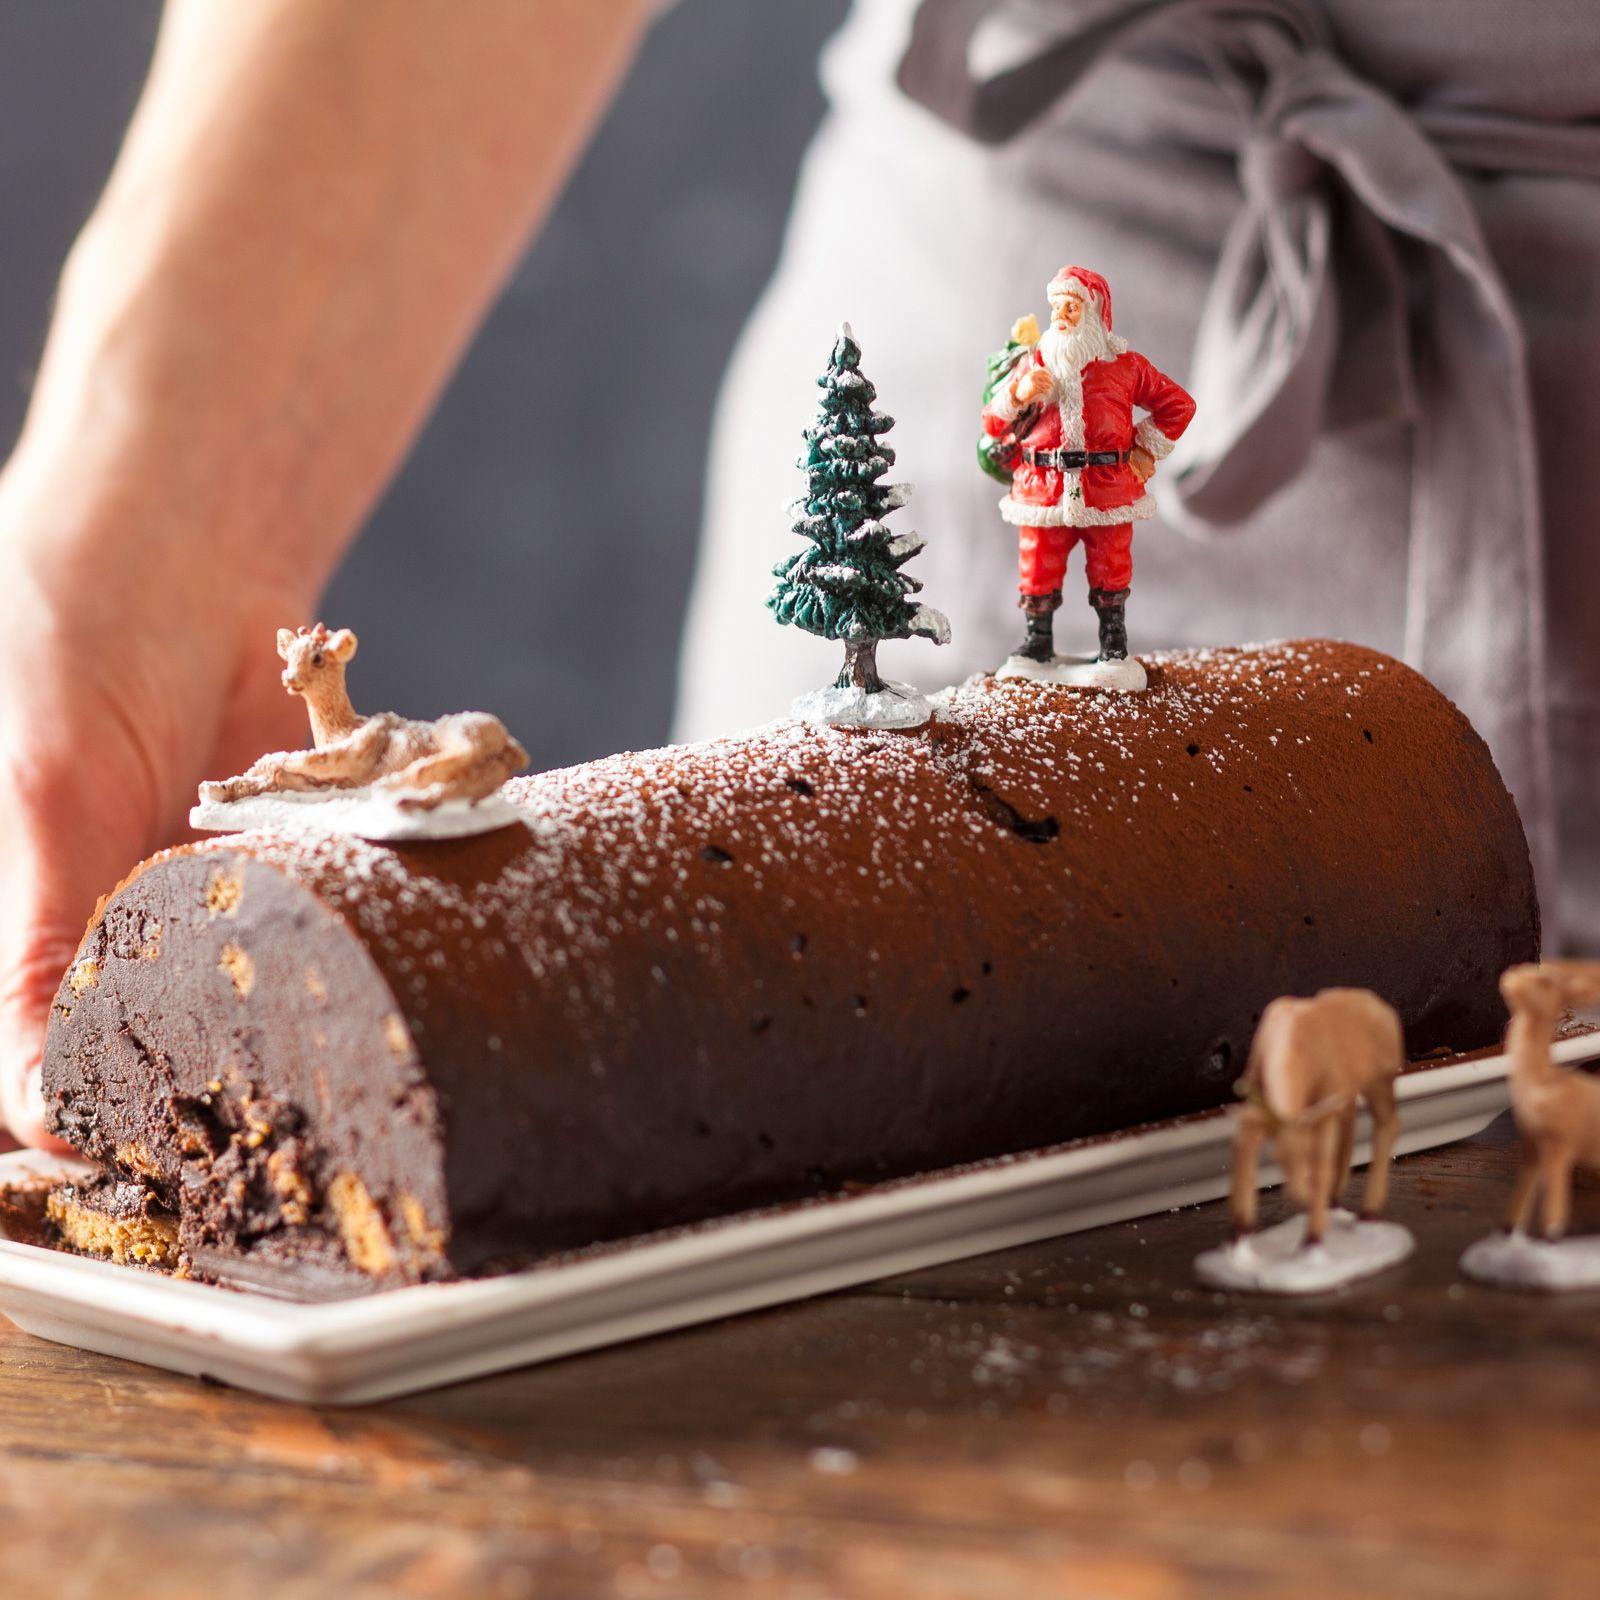 La Buche En 15 Minutes Chrono Dessert Noel Facile Dessert Noel Buche De Noel